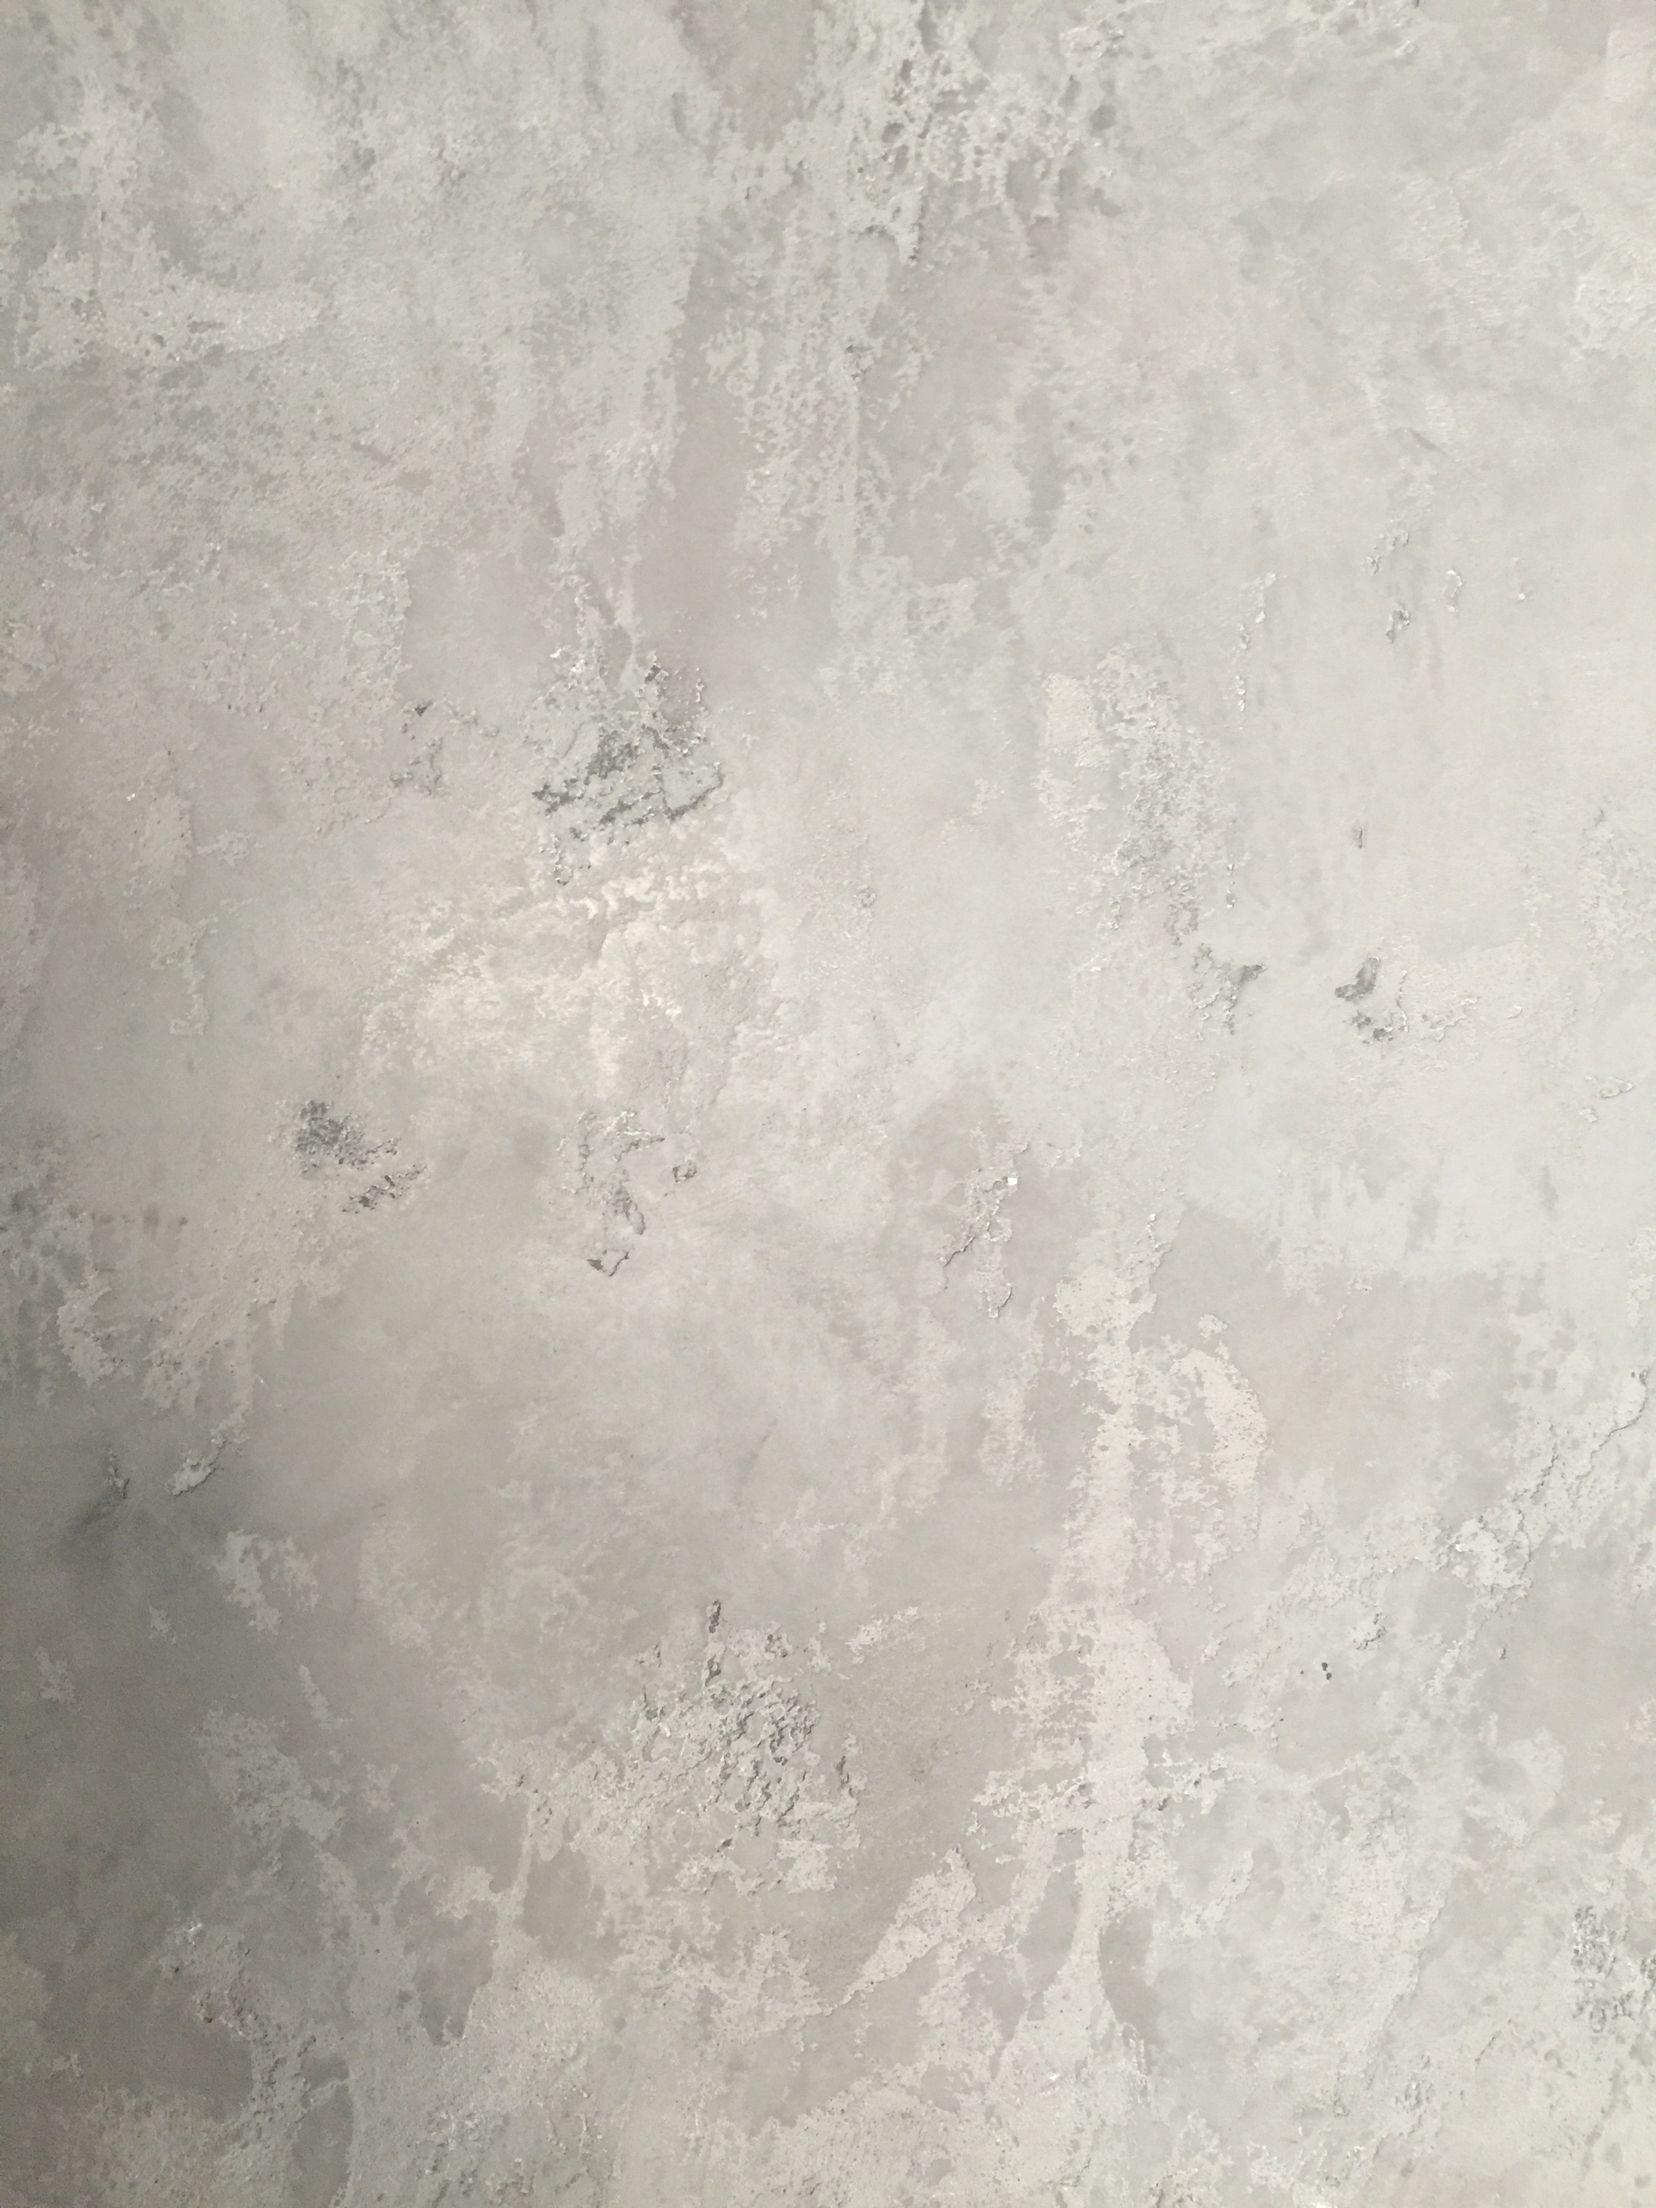 Decorative Distressed Concrete Plaster Limestone Finish Fireplace Plaster Wall Texture Concrete Wall Texture Plaster Walls